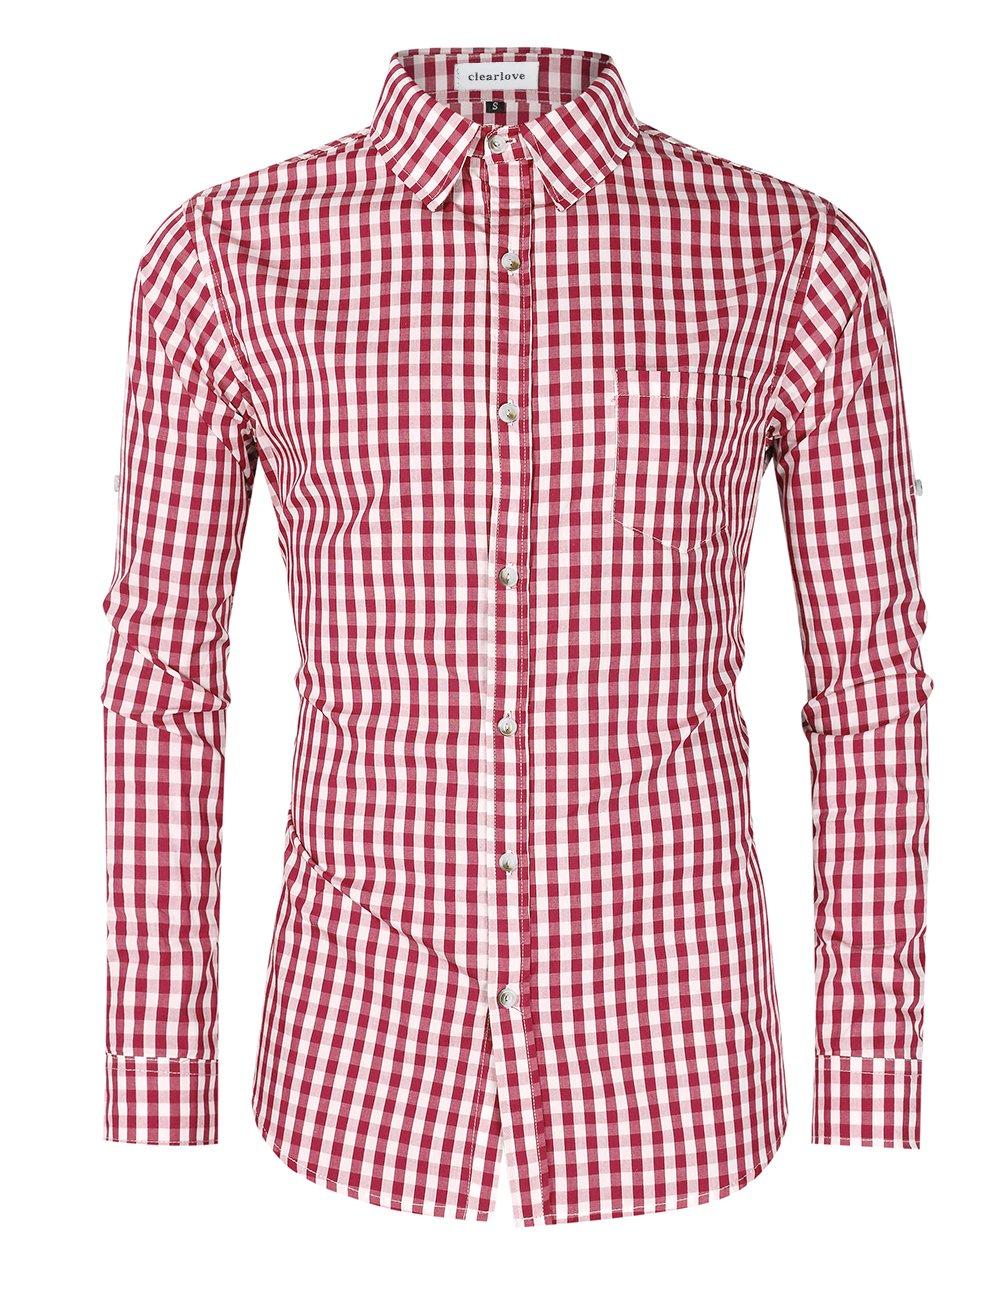 Clearlove Men's Casual Slim Fit Plaid Shirt Button Down Dress Shirts for German Bavarian Oktoberfest Red M